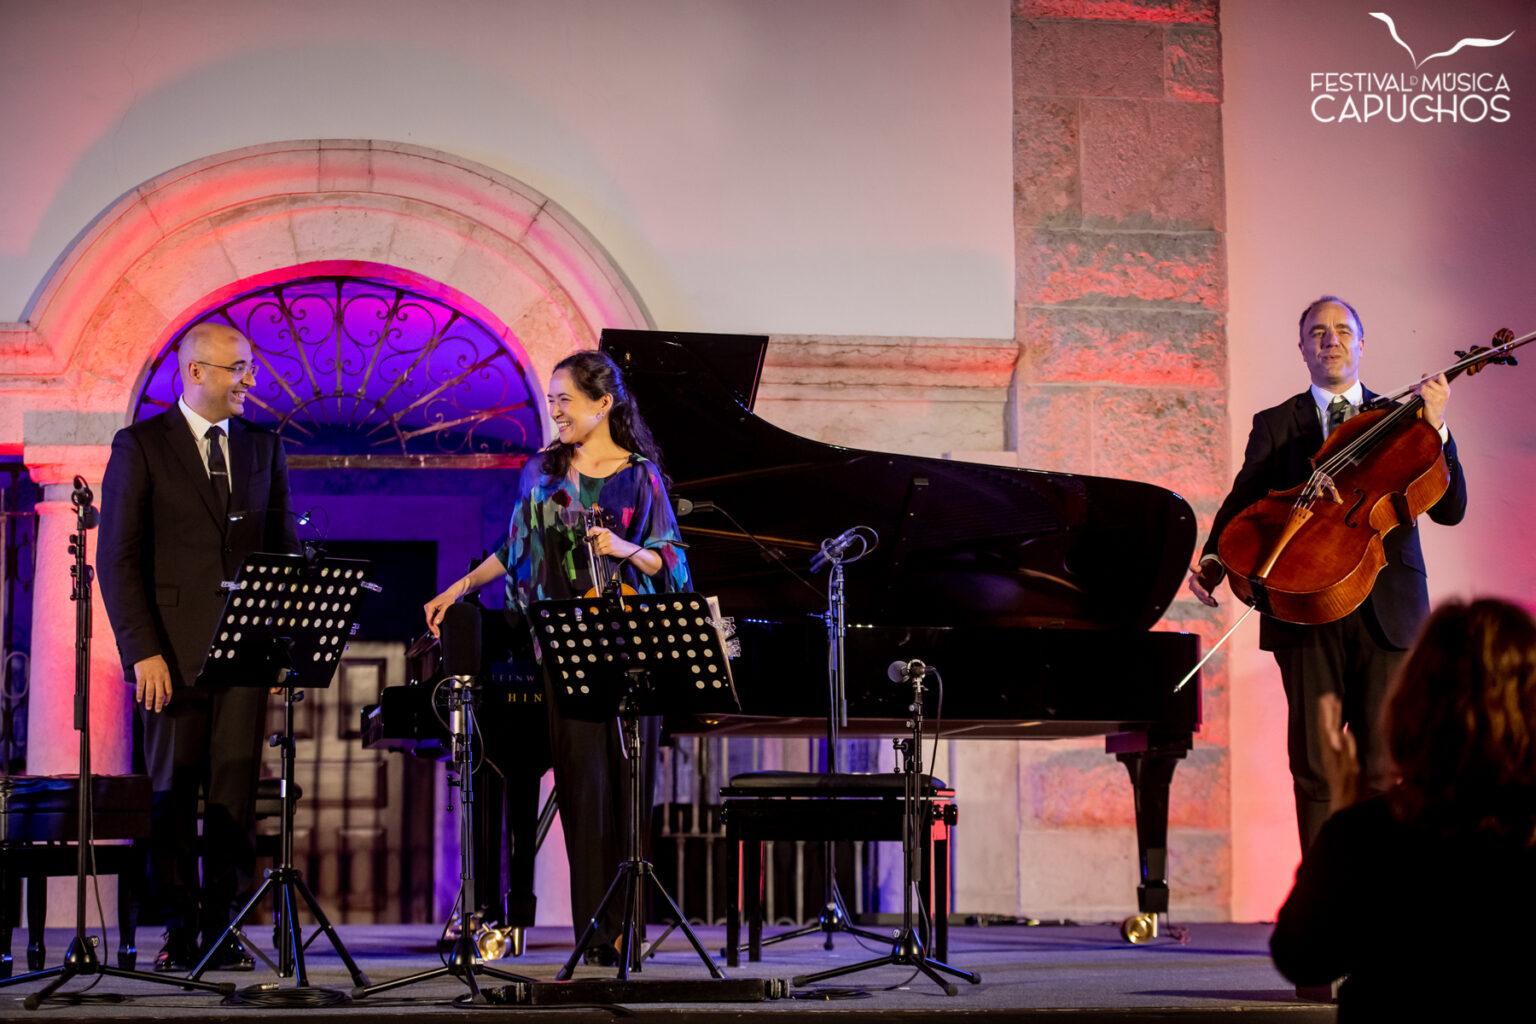 FESTIVAL DOS CAPUCHOS - SCHBERTÍADA 1 - HOMENAGEM A ALFRED BRENDEL - Viviane Hagner - violino; Adrian Brendel - Violoncelo;  Filipe Pinto-Ribeiro - piano